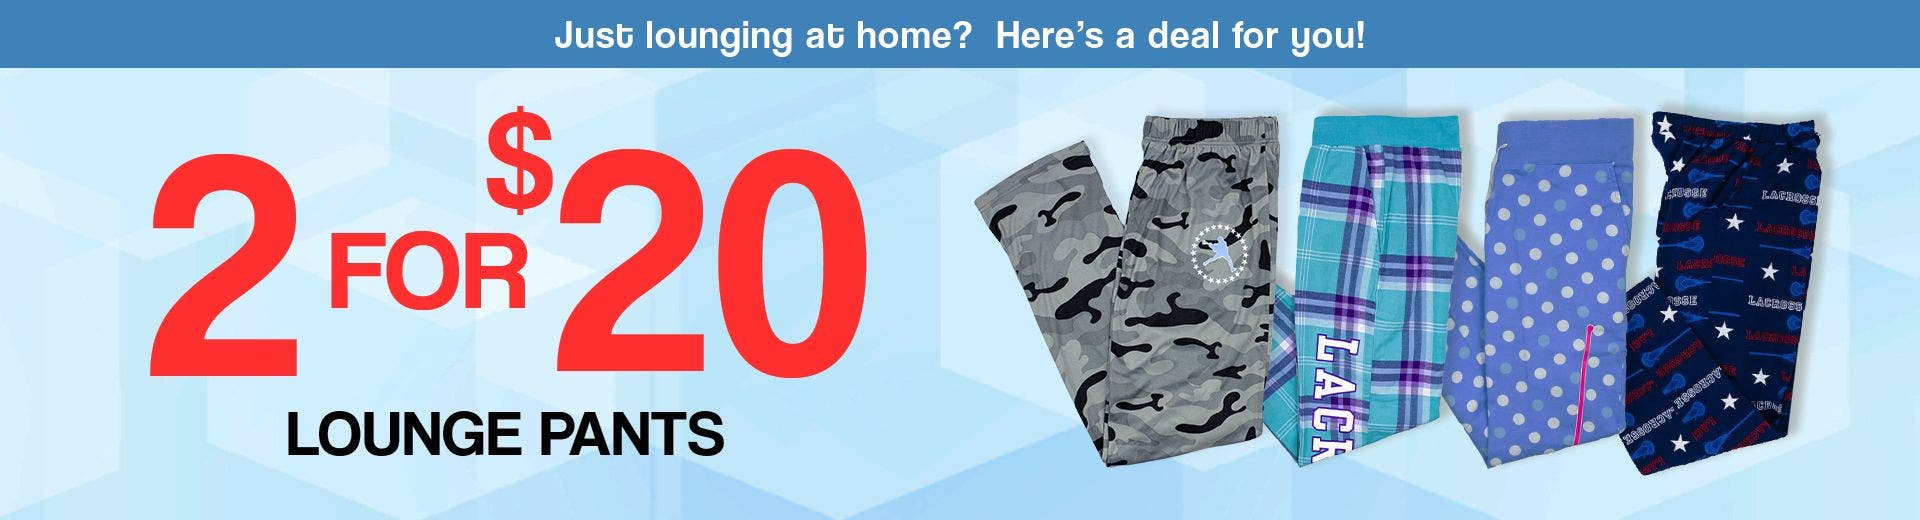 2 For $20 Lounge Pants - DESKTOP